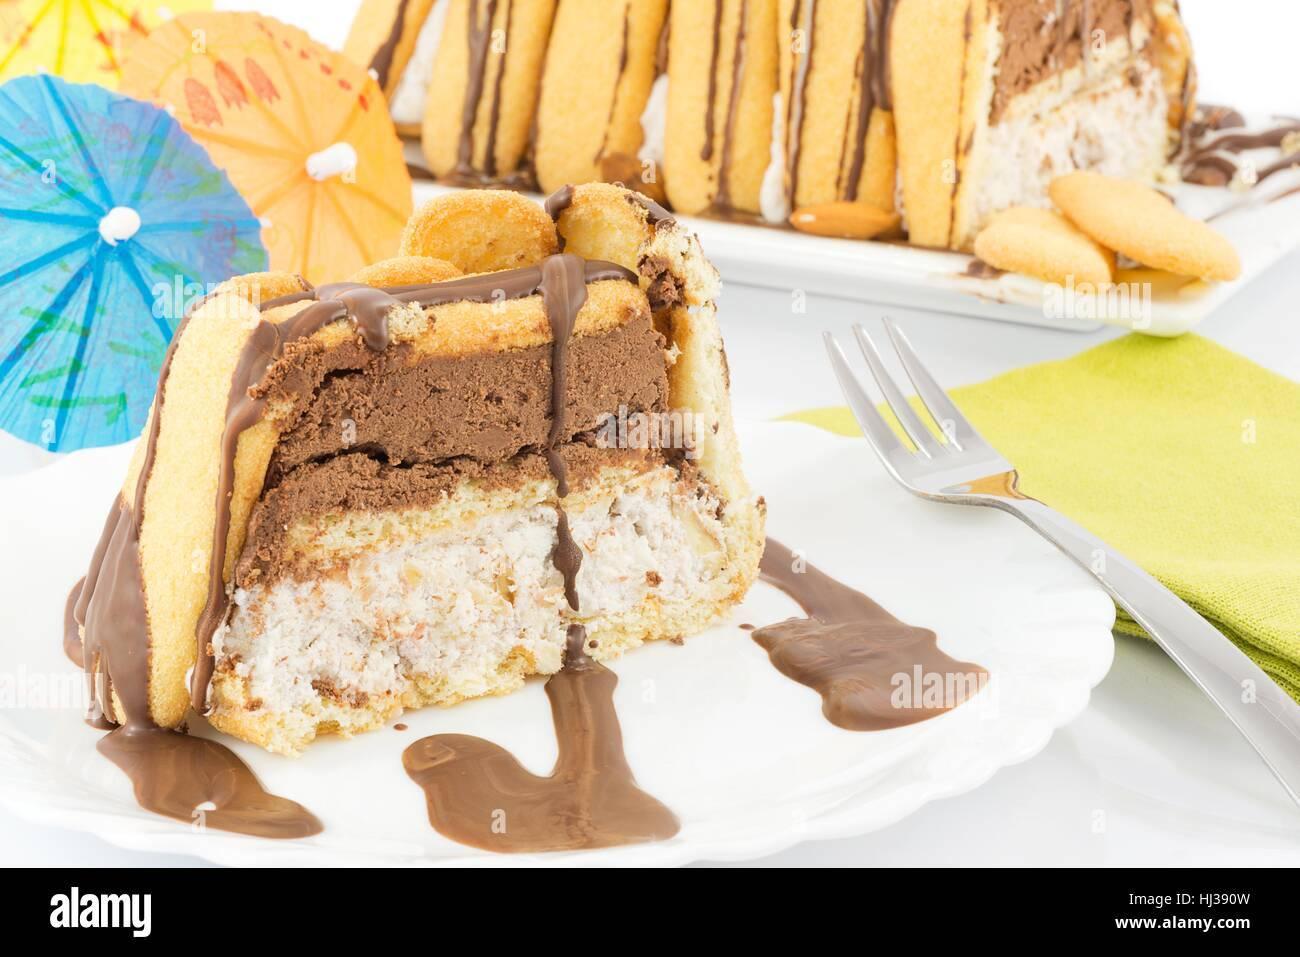 Kuchen Torte Kuchen Eis Eis Eis Dessert Schokolade